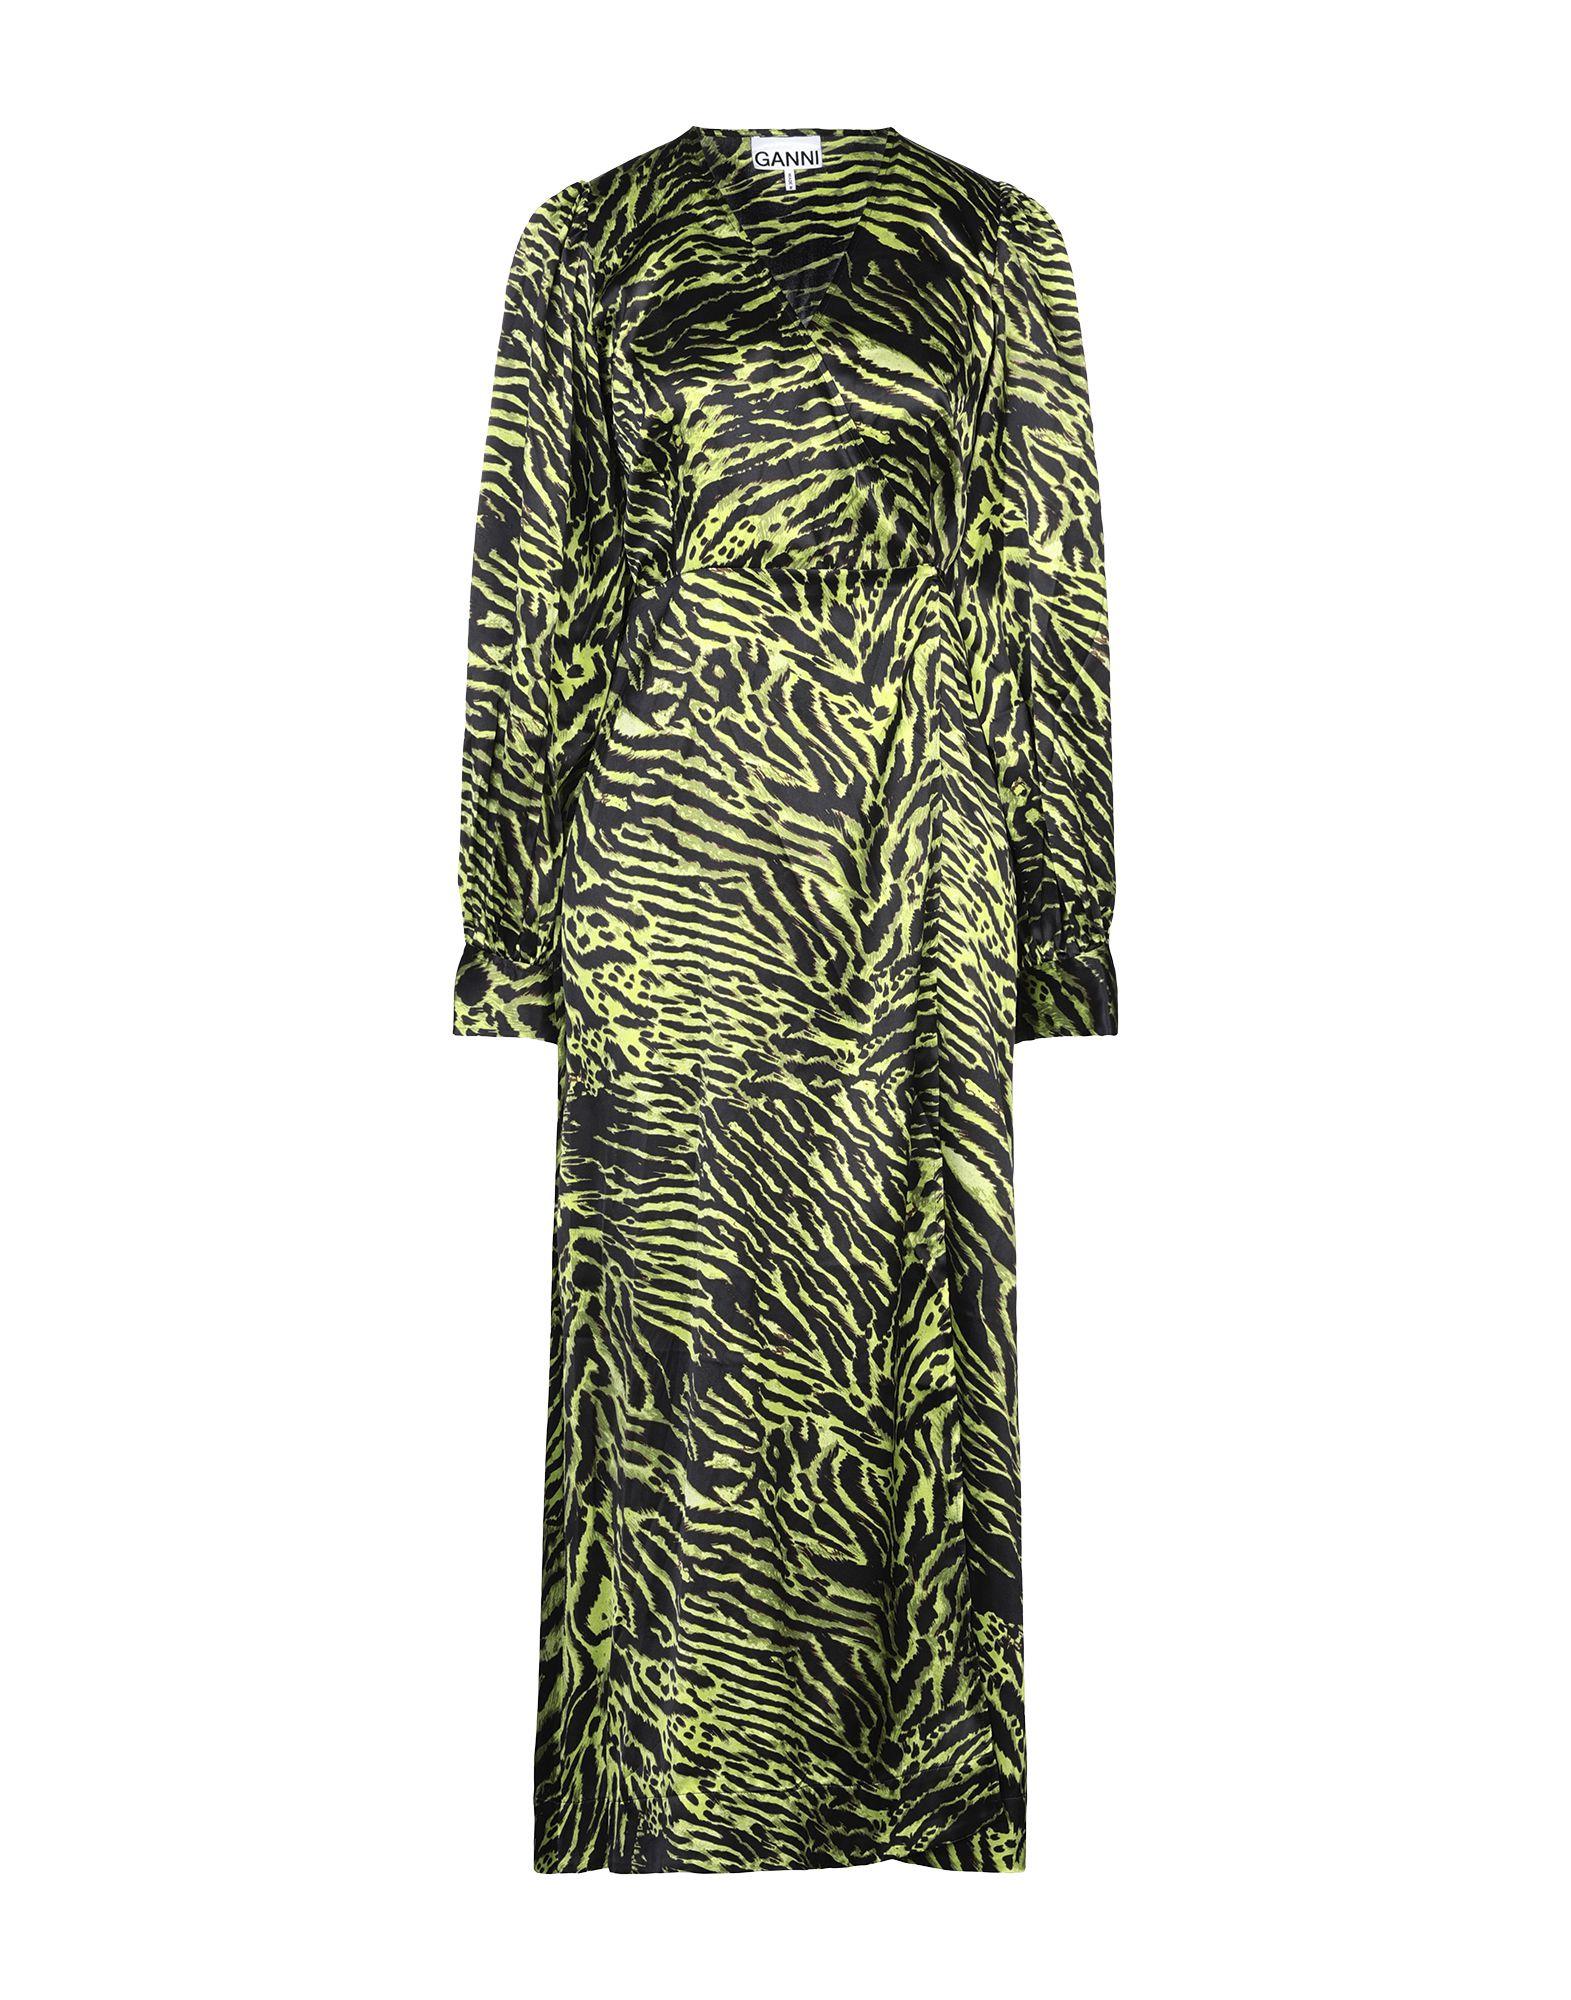 GANNI Long dresses. satin, no appliqués, tiger stripes, deep neckline, long sleeves, no pockets, front closure, self-tie wrap closure, unlined, stretch. 92% Silk, 8% Elastane